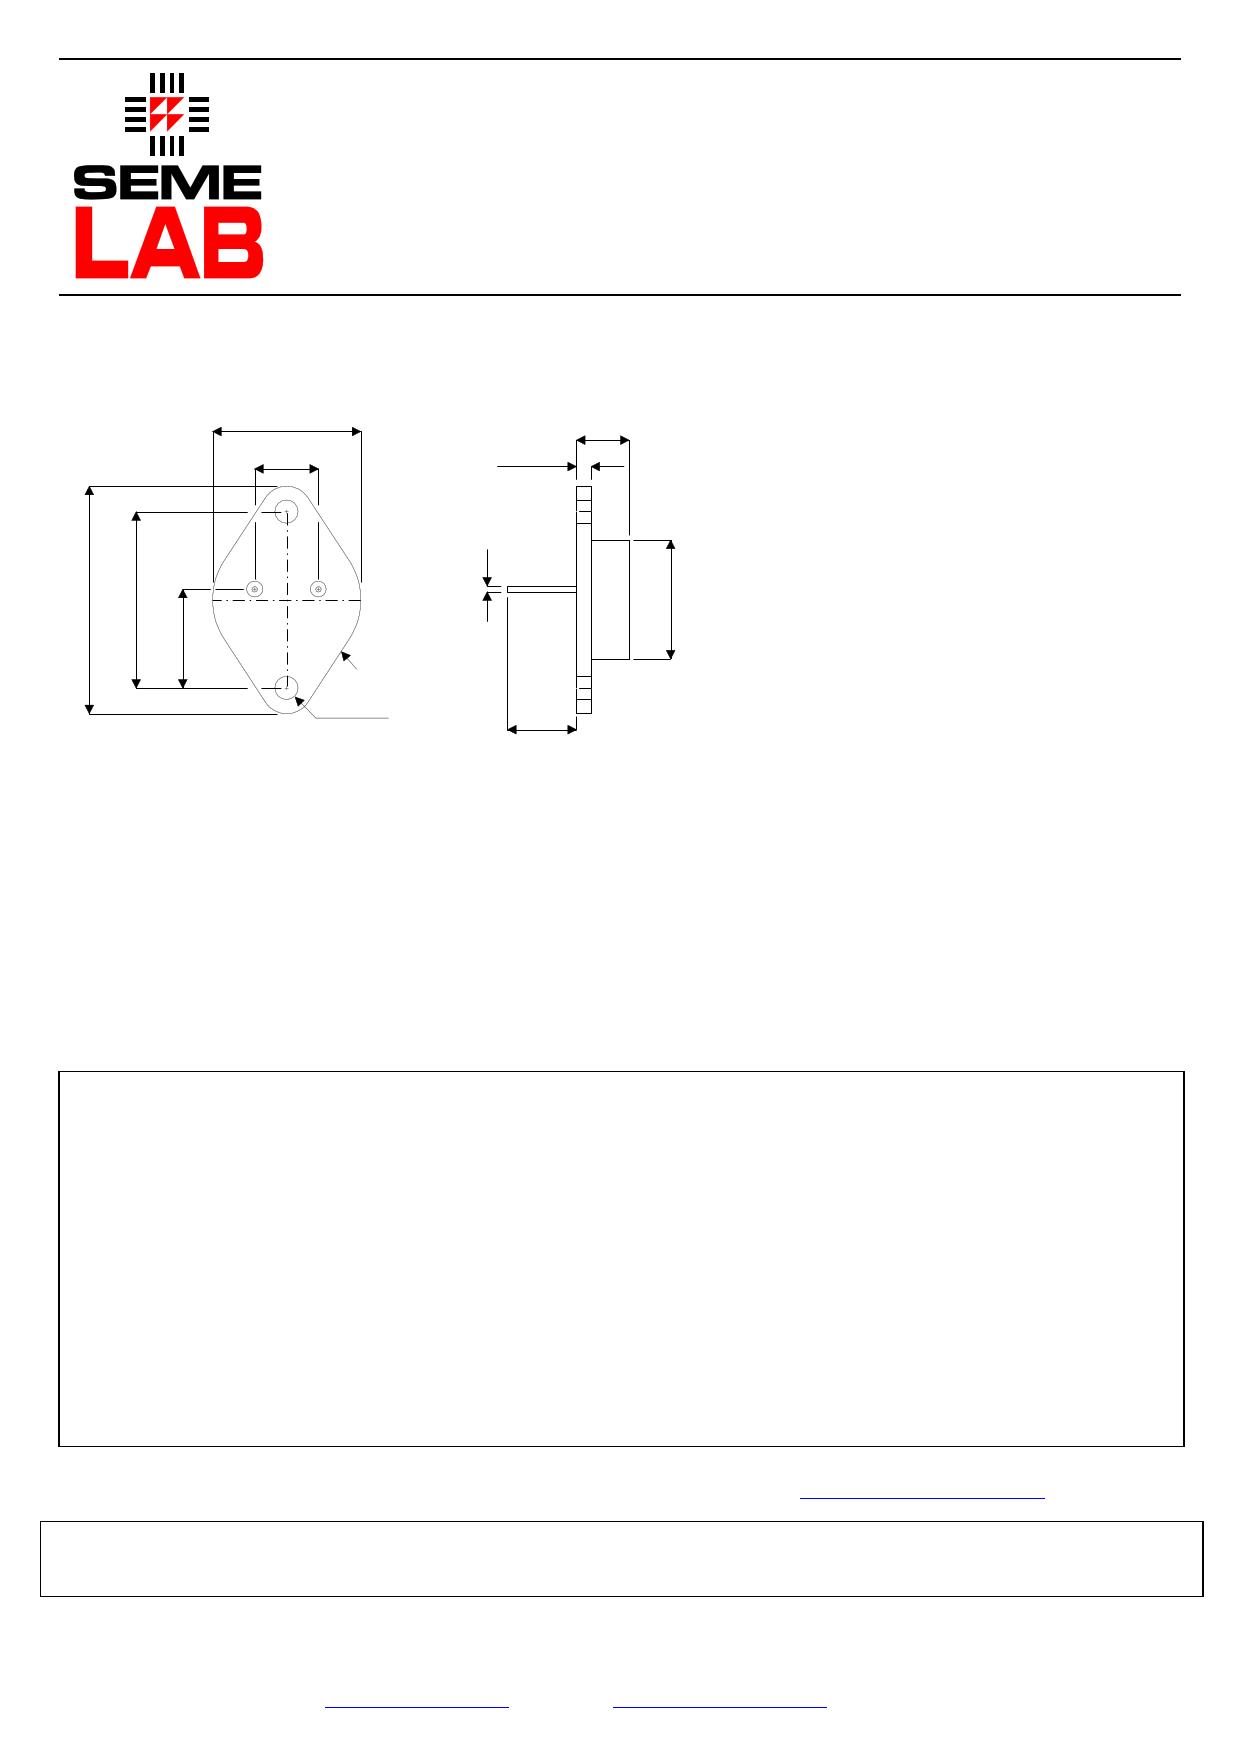 2N5614 datasheet